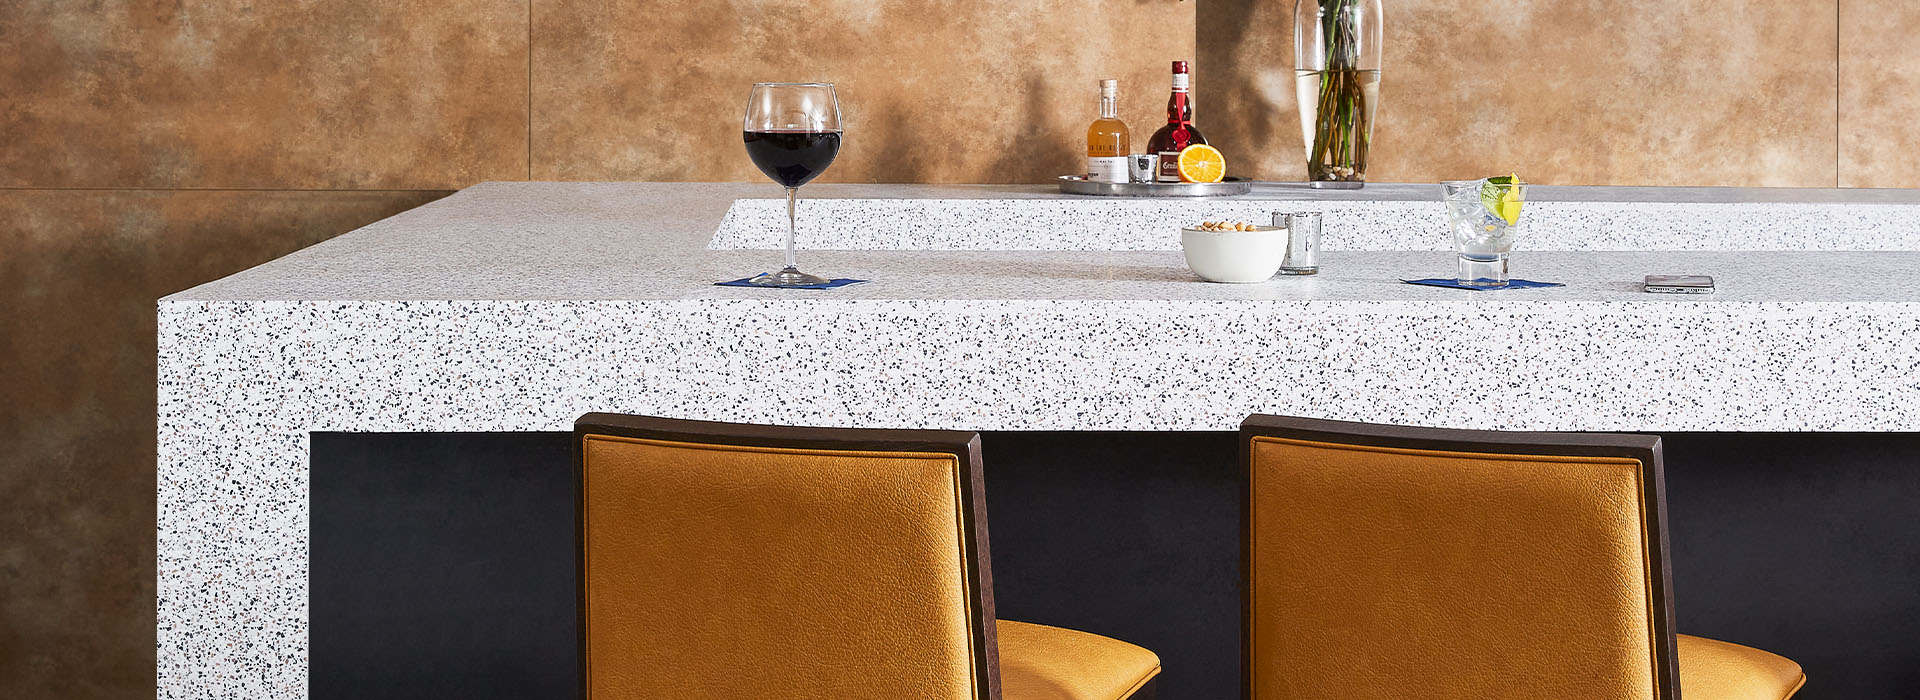 412 Dalmata Terrazzo Matrix table with drinks and stools